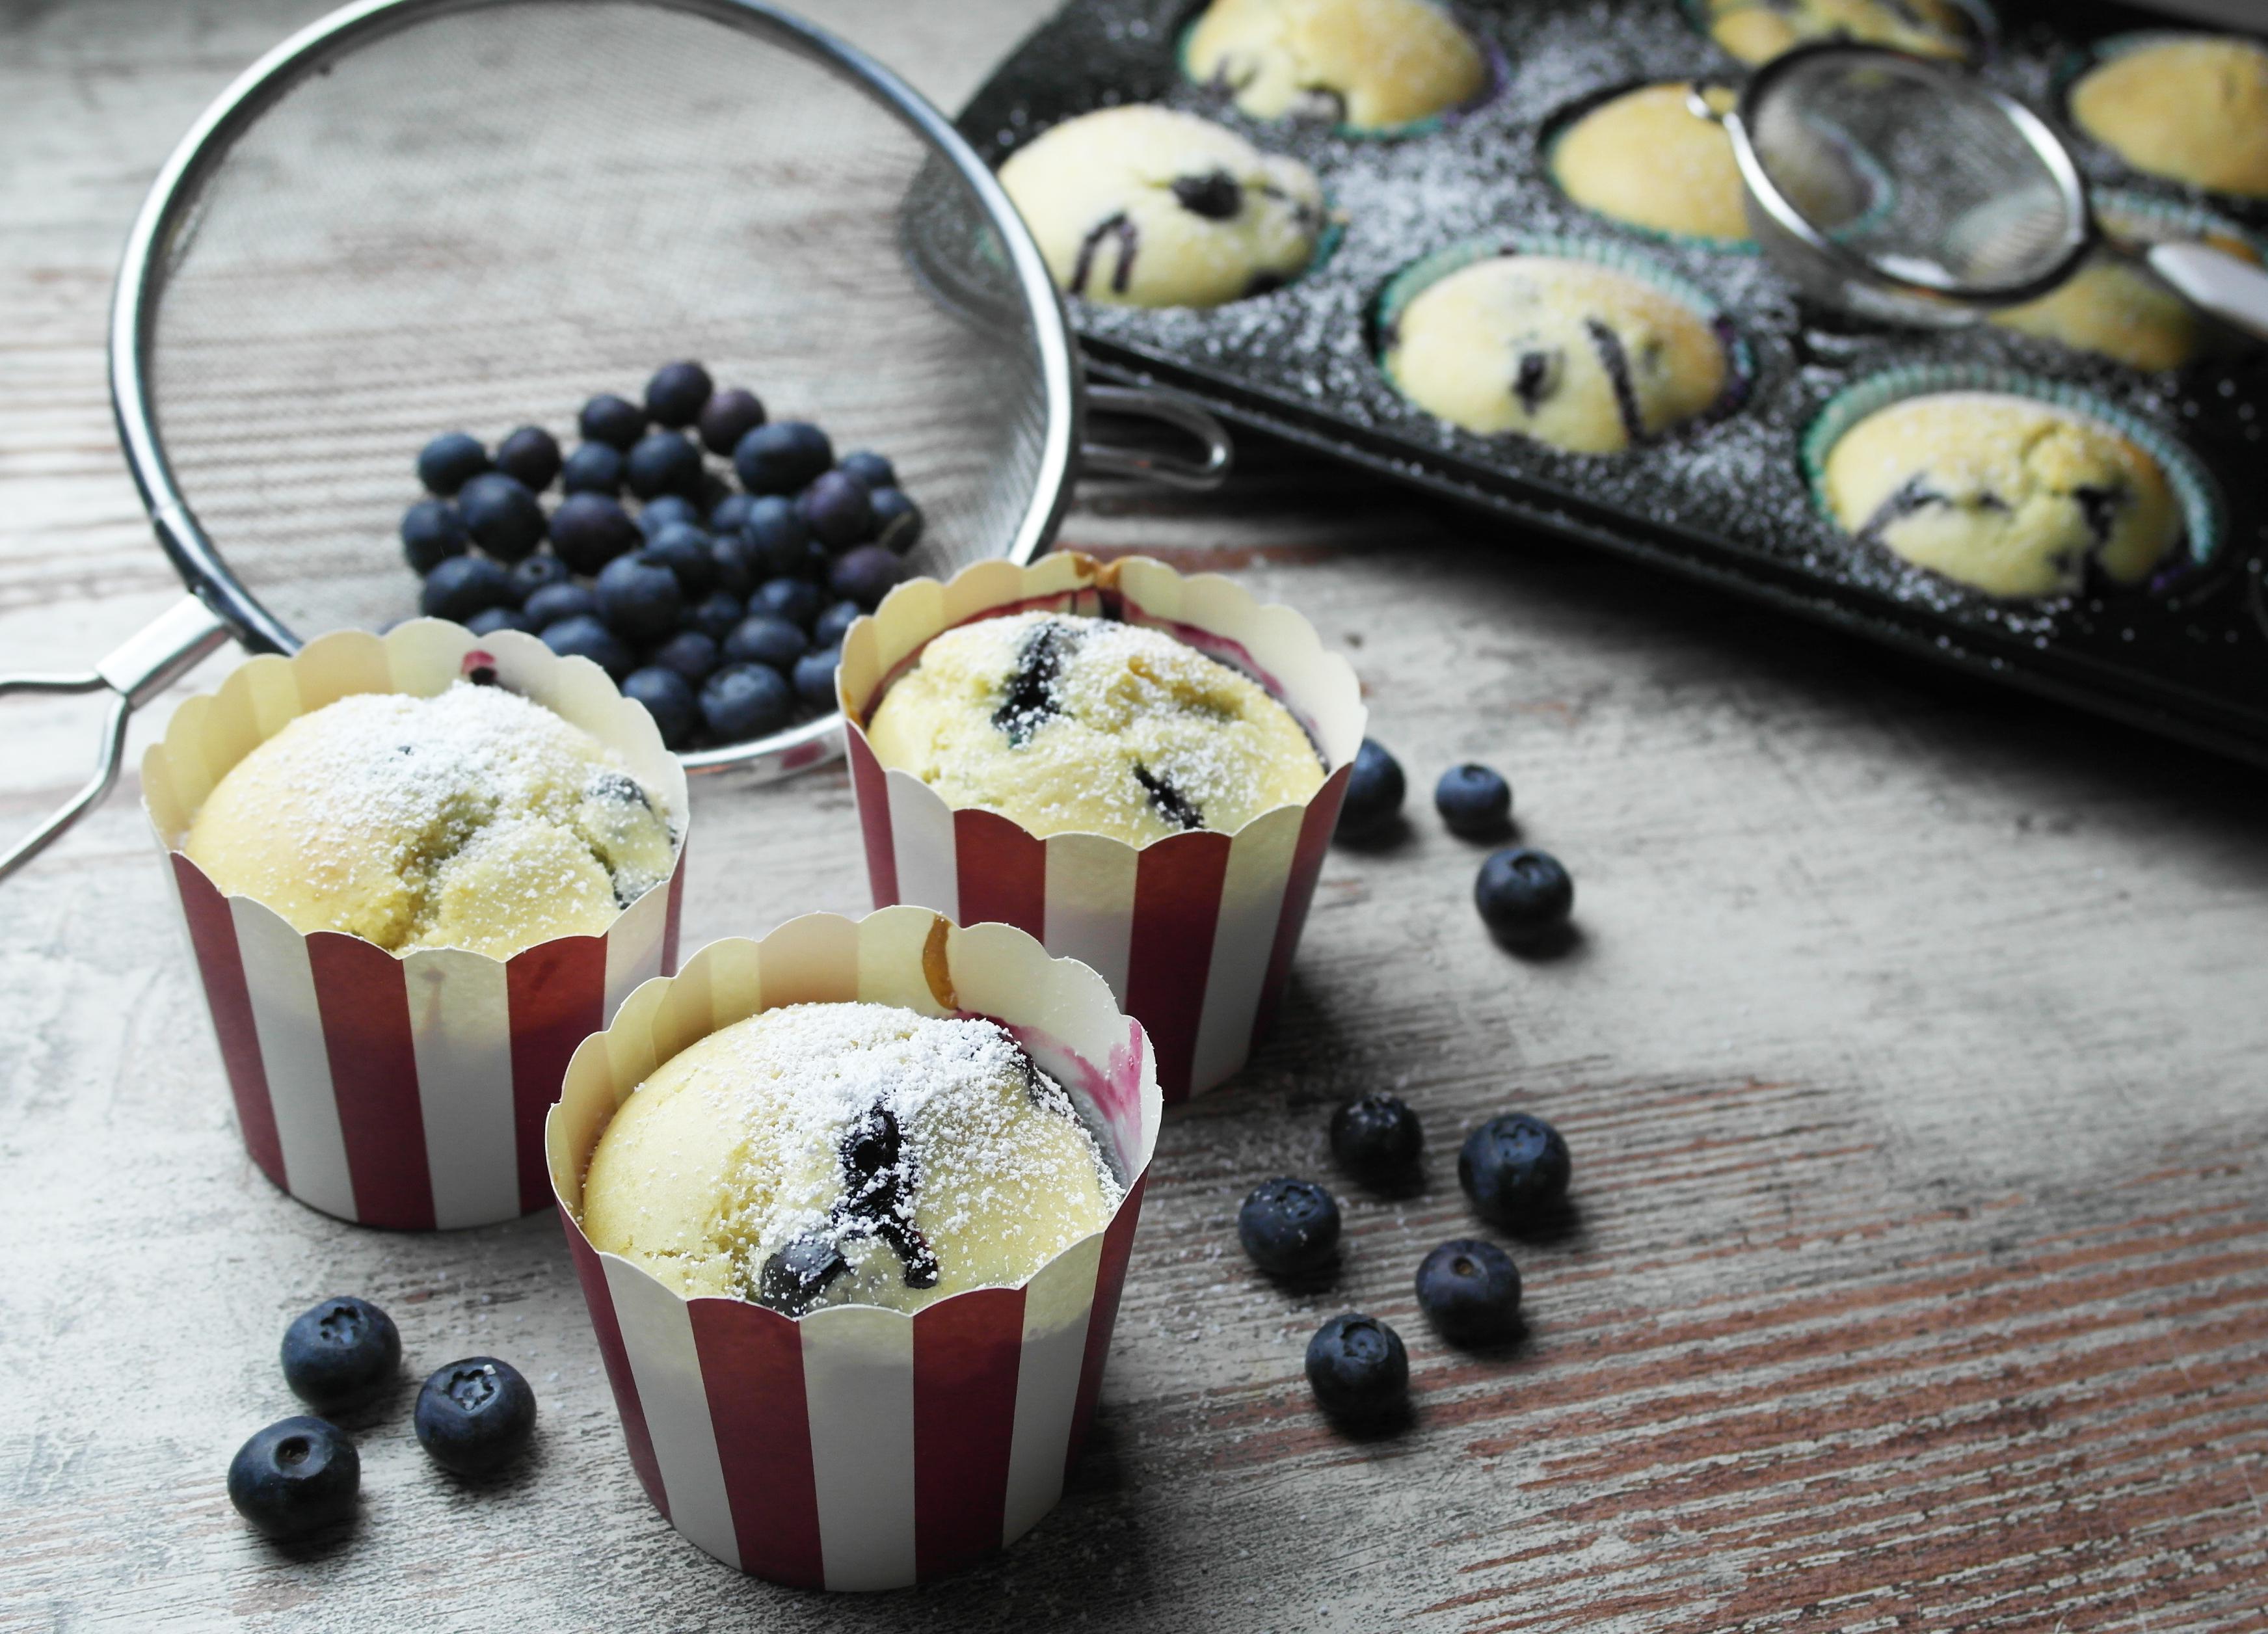 frühlingshafte heidelbeer-muffins (blaubeer-muffins) | springtime blueberry muffins (vegan) ❤